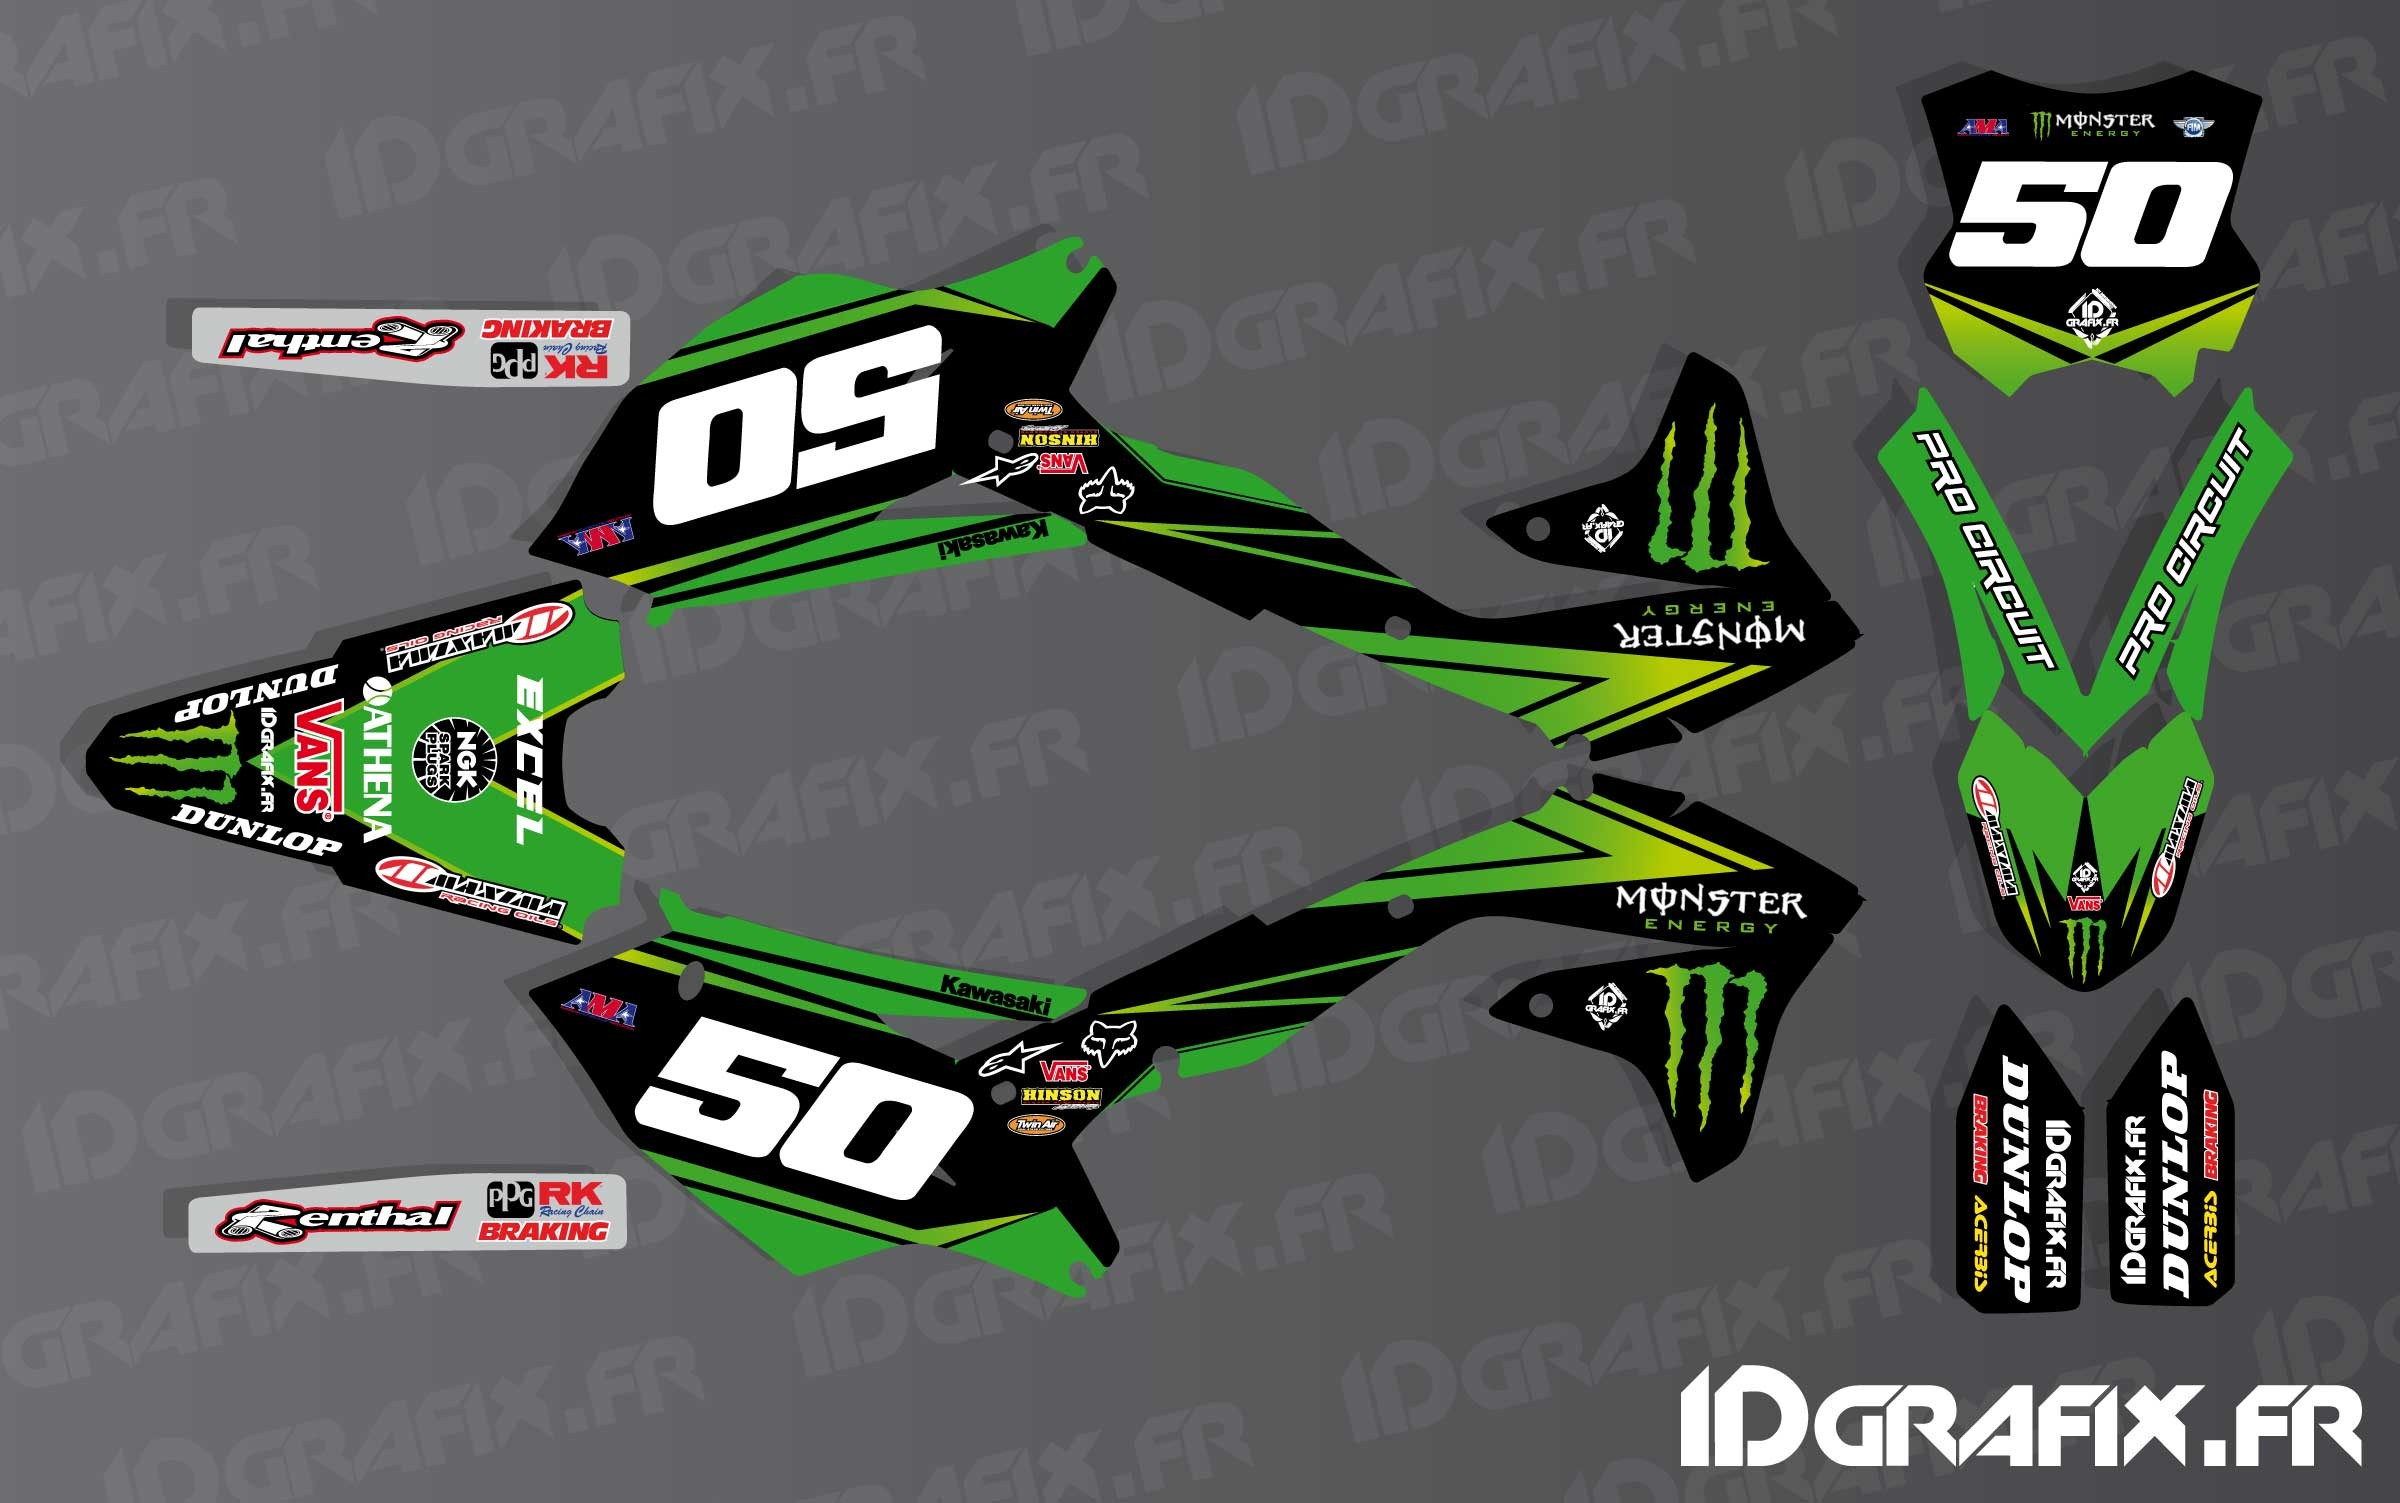 Deco Motocross Stunning With Deco Motocross Crf Graphics Kit Crf